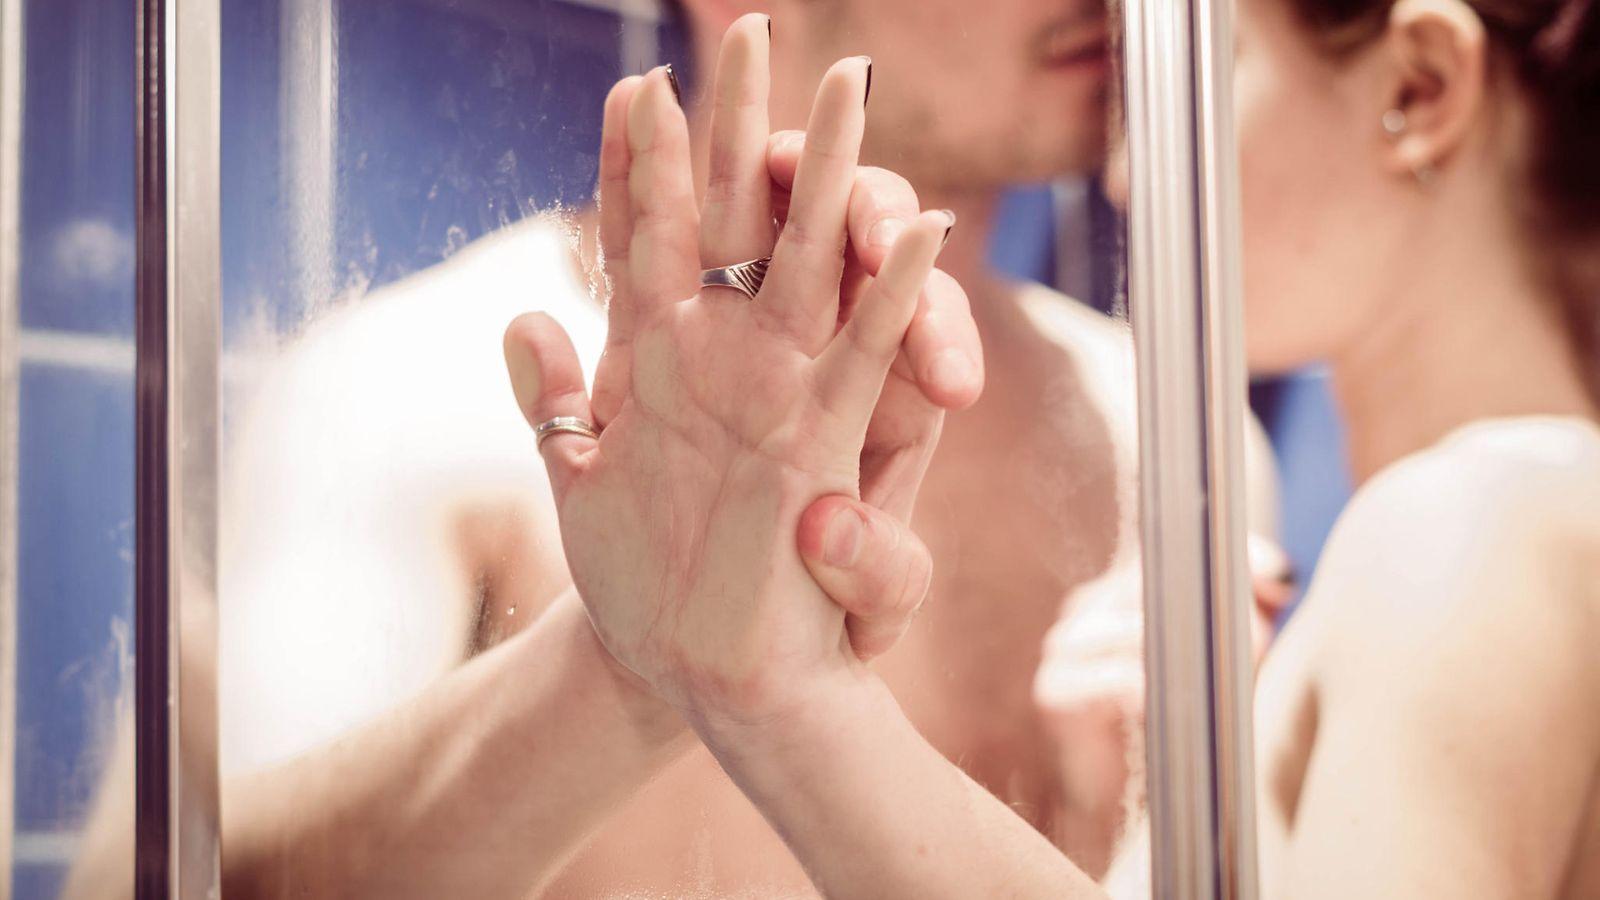 thai hieronta joensuu masturbointi videoita